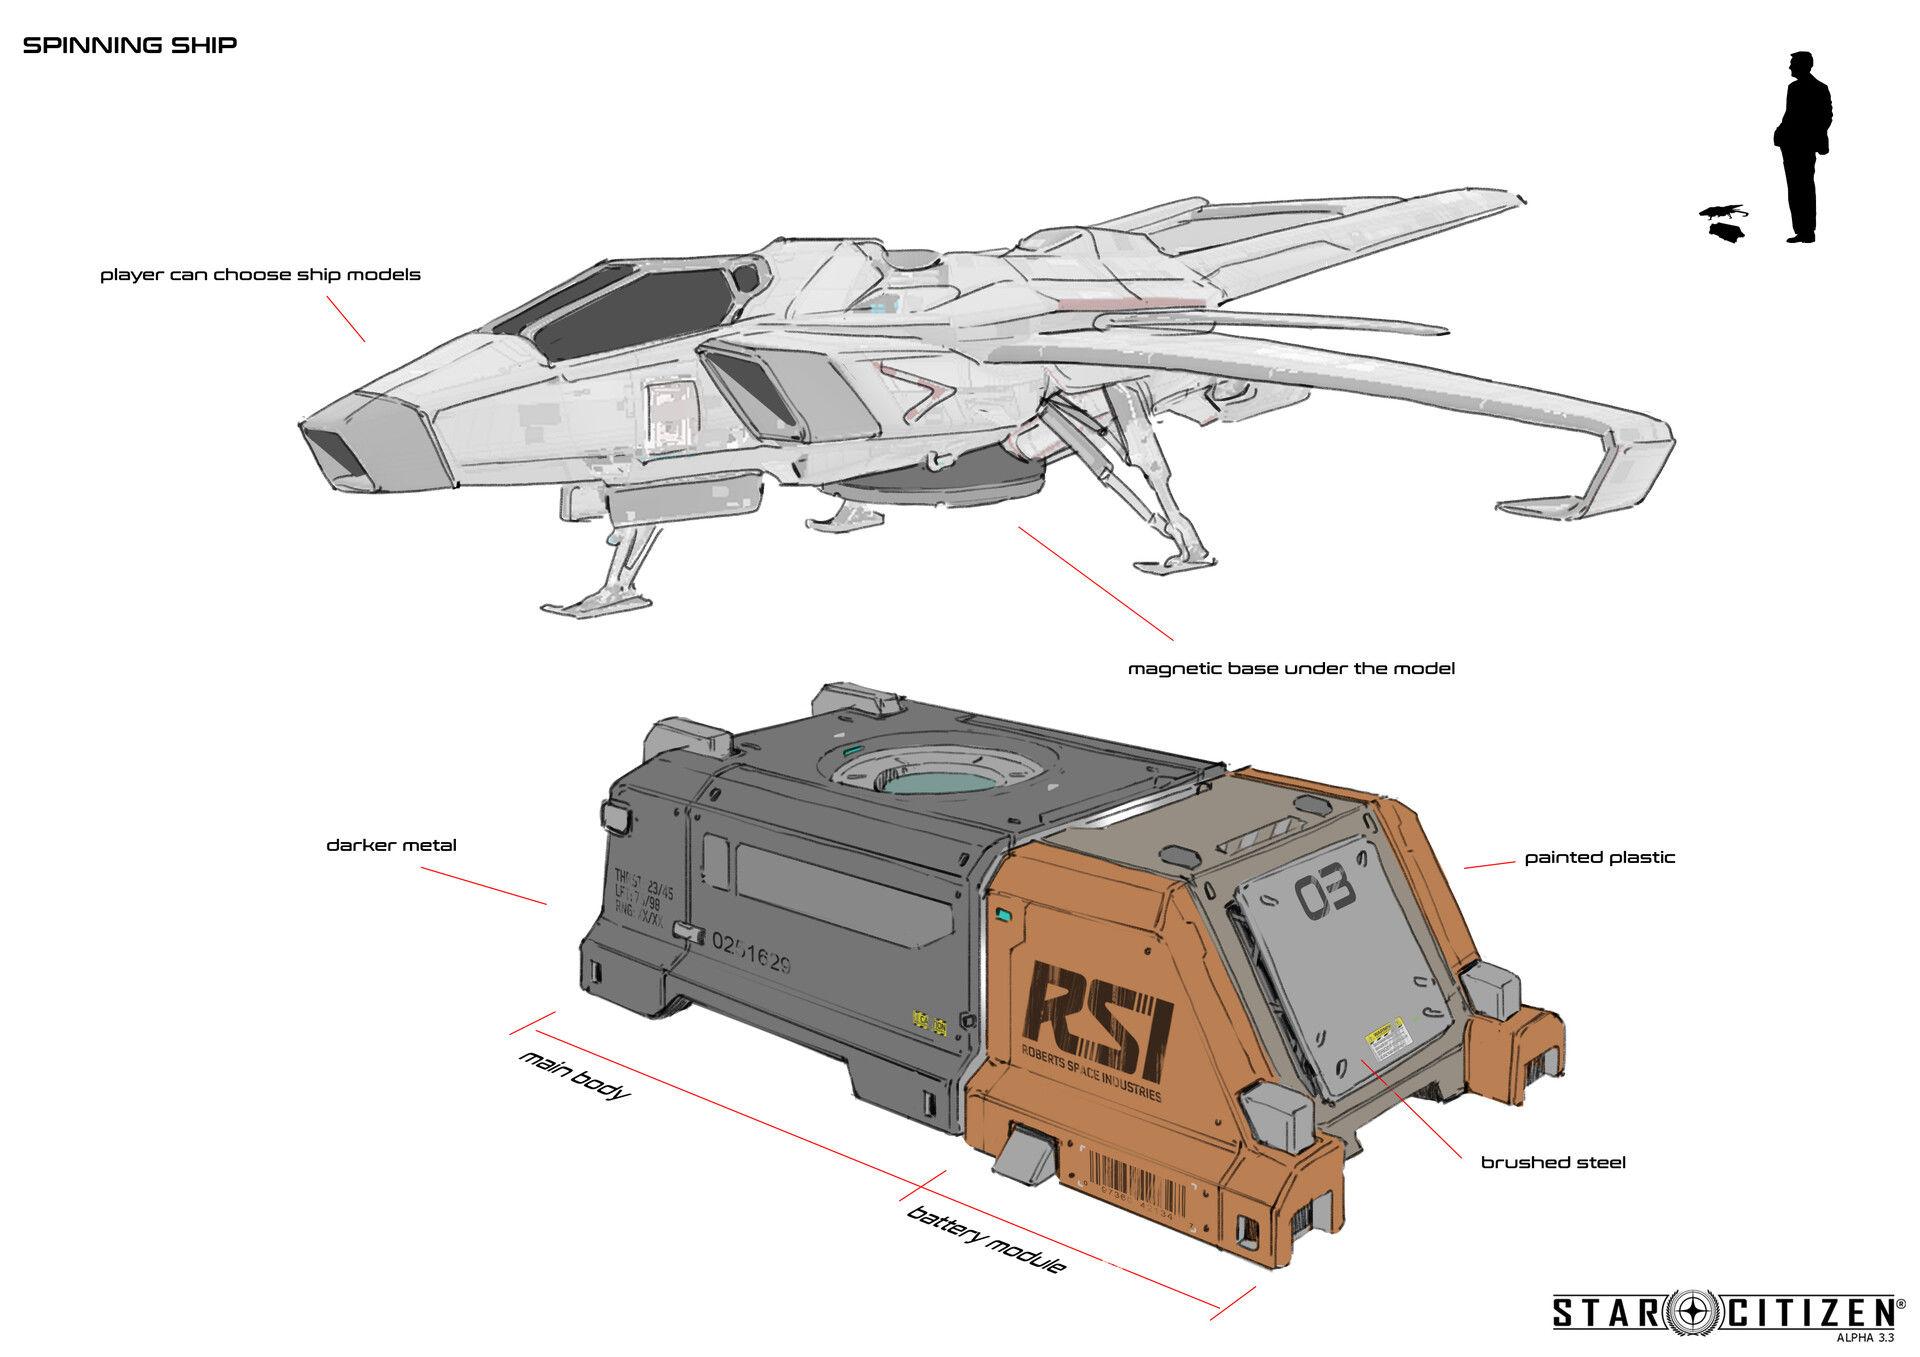 Spining ship - koncept